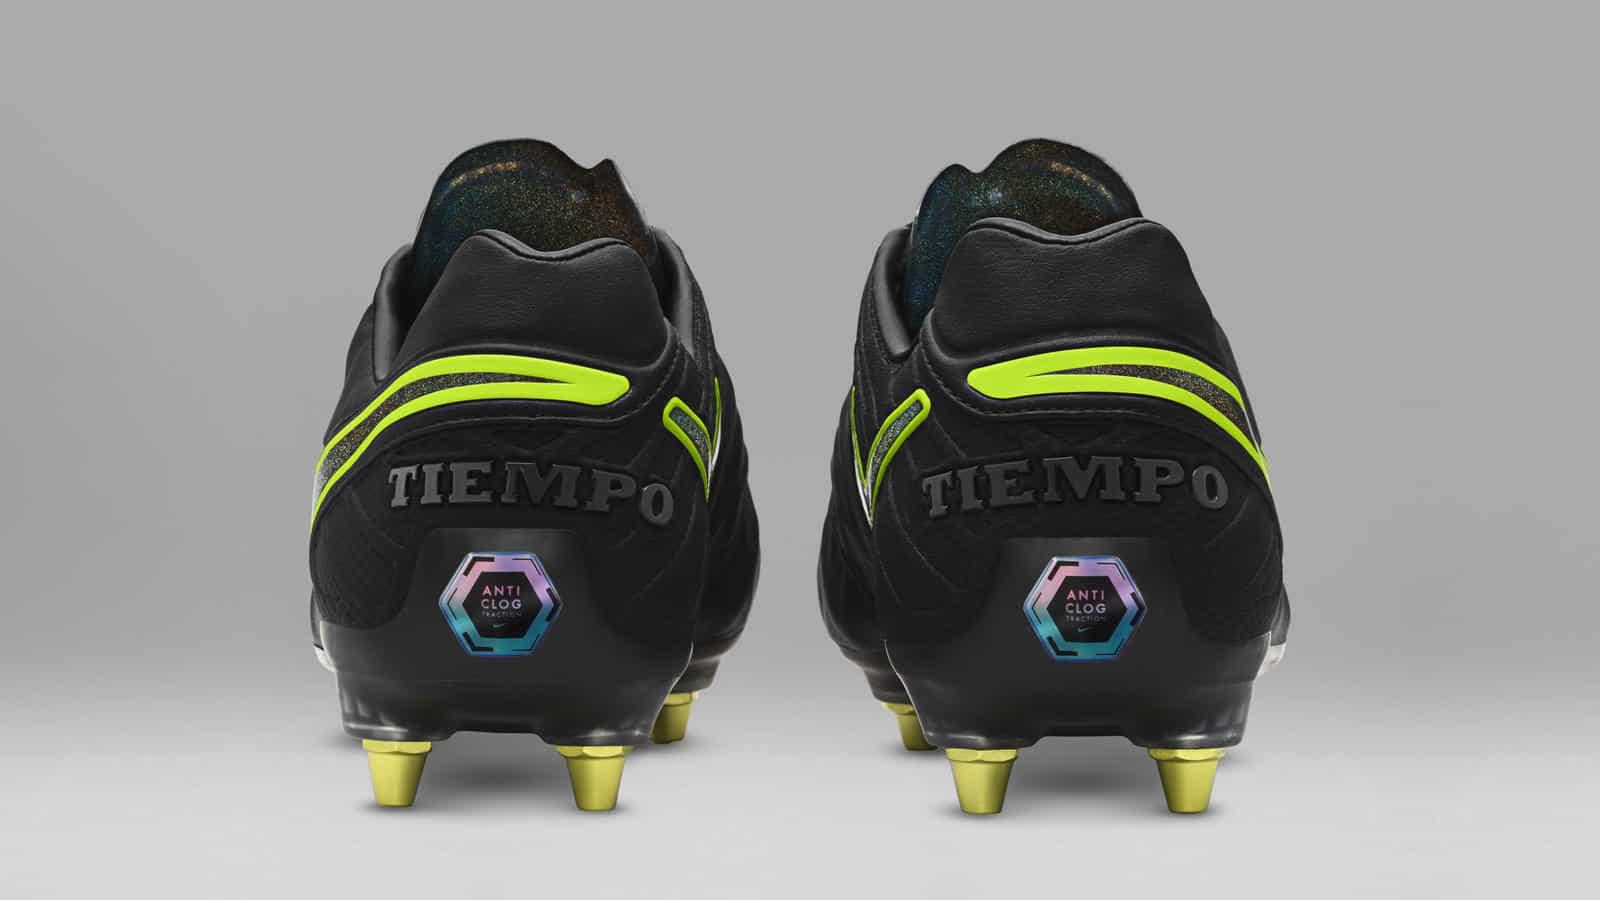 technologie-nike-anti-clog-chaussure-foot-tiempo-legend